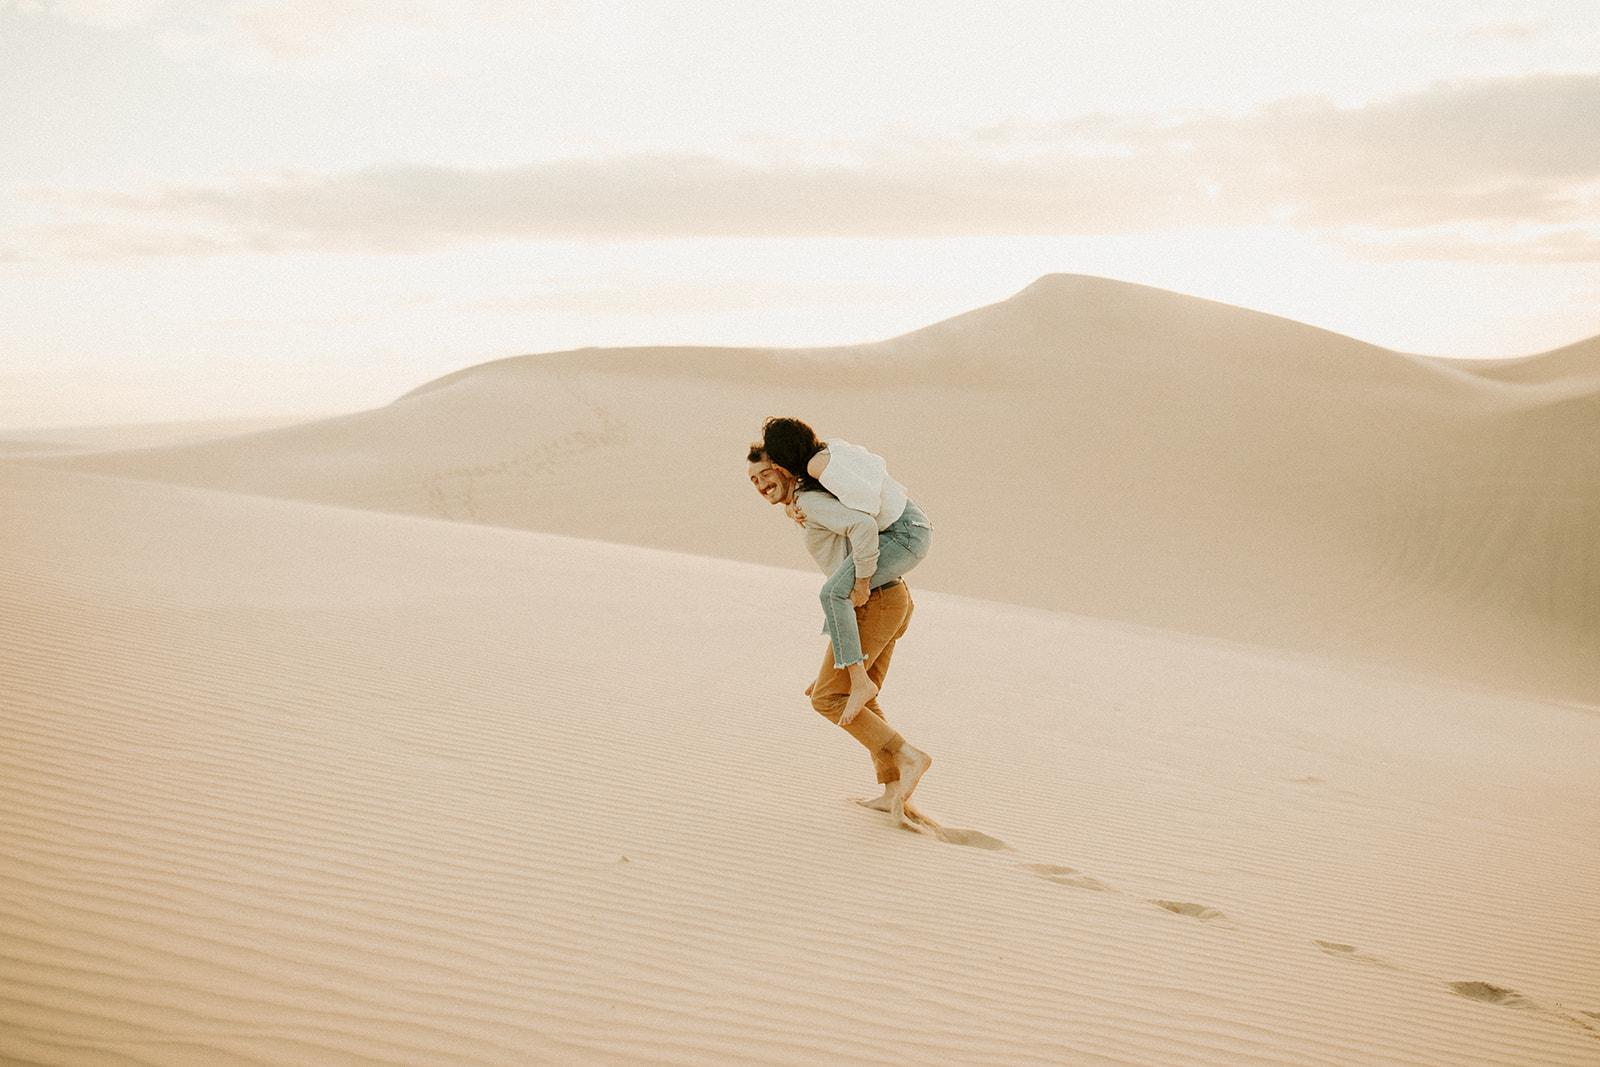 Imperial_Sand_Dunes_Linda_and_Sam_Dawn_Charles_Photographer-23.jpg